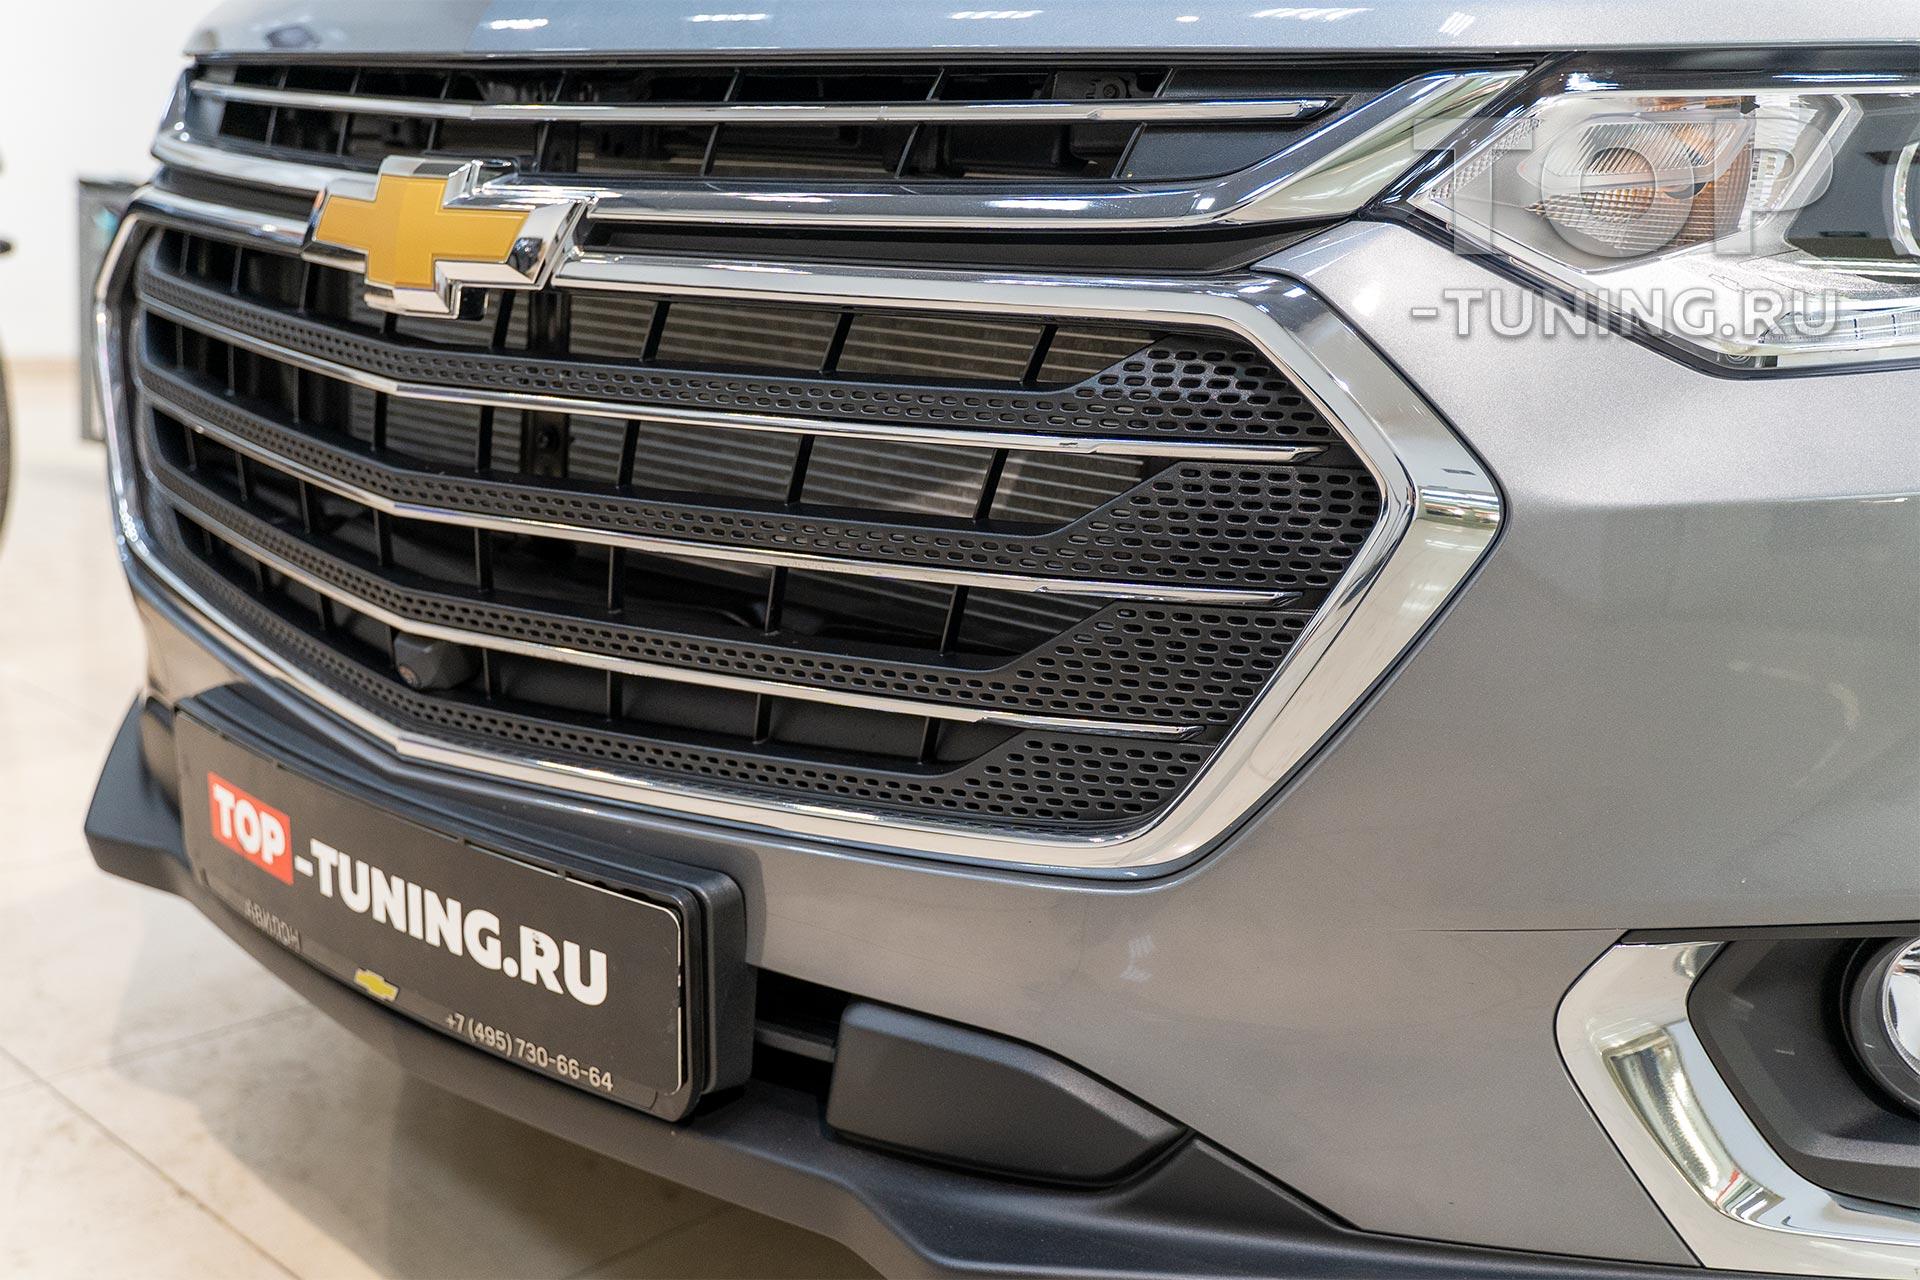 104007 Установка сетки в бампер Chevrolet Traverse II 2020